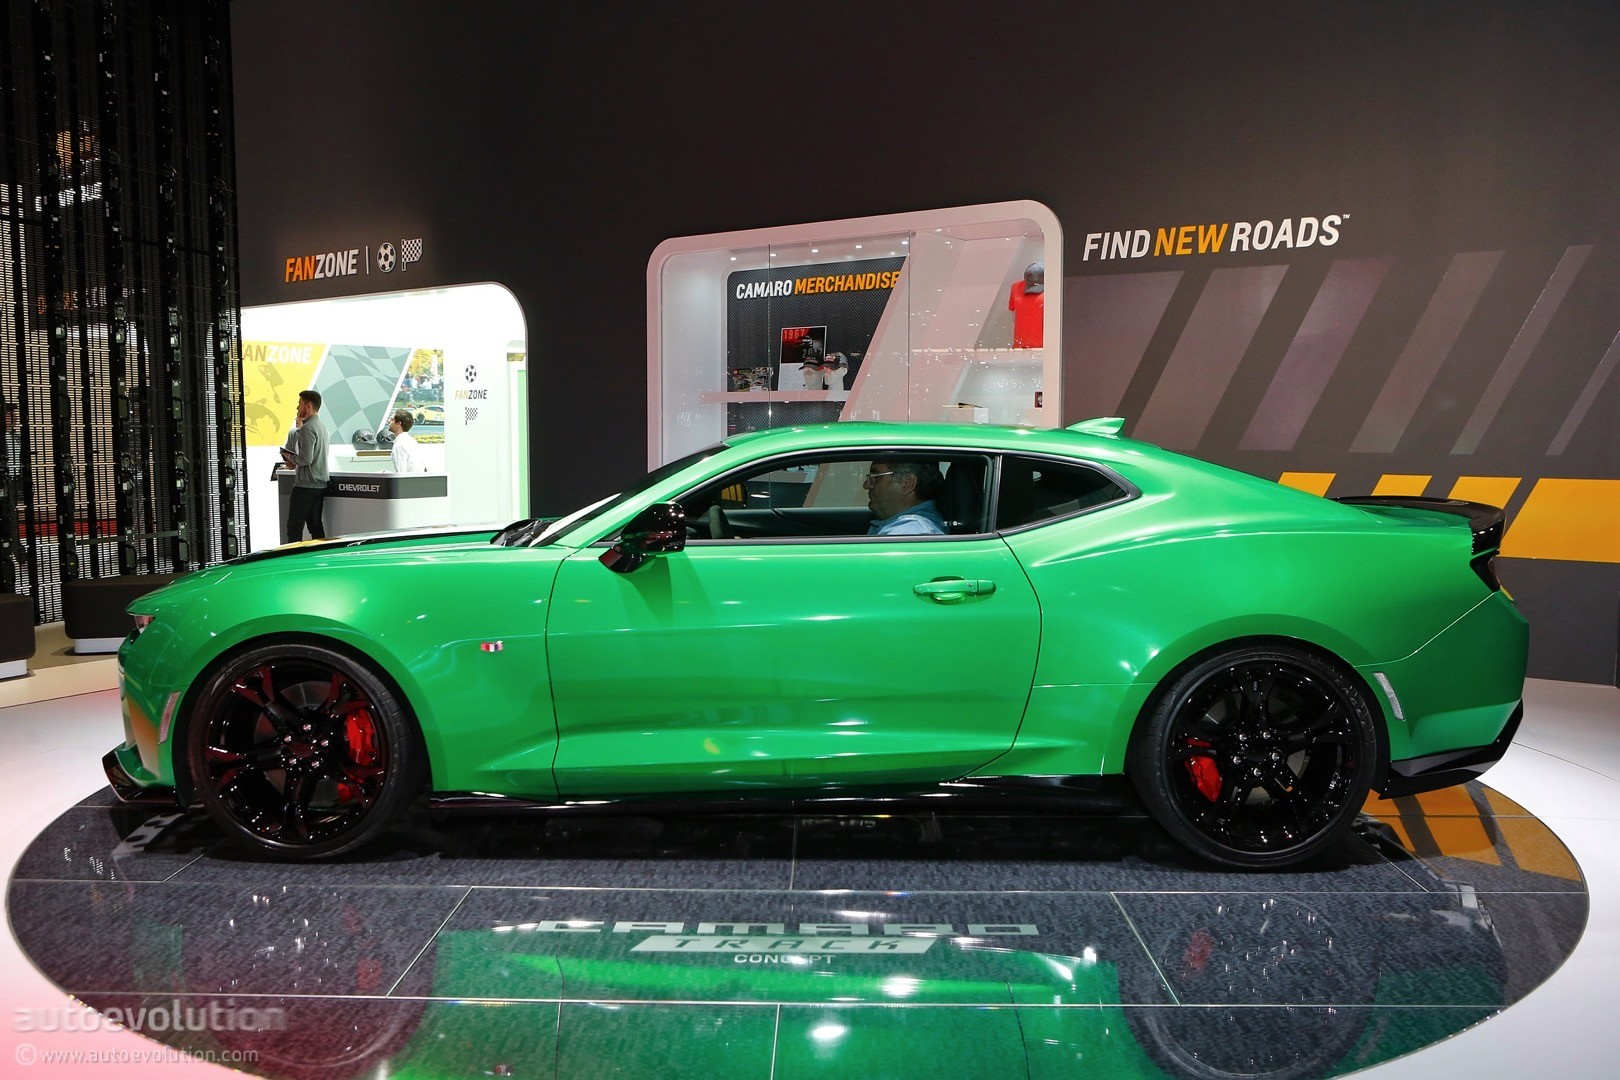 Chevrolet S Geneva Concept Is A Camaro 1le In Disguise Autoevolution